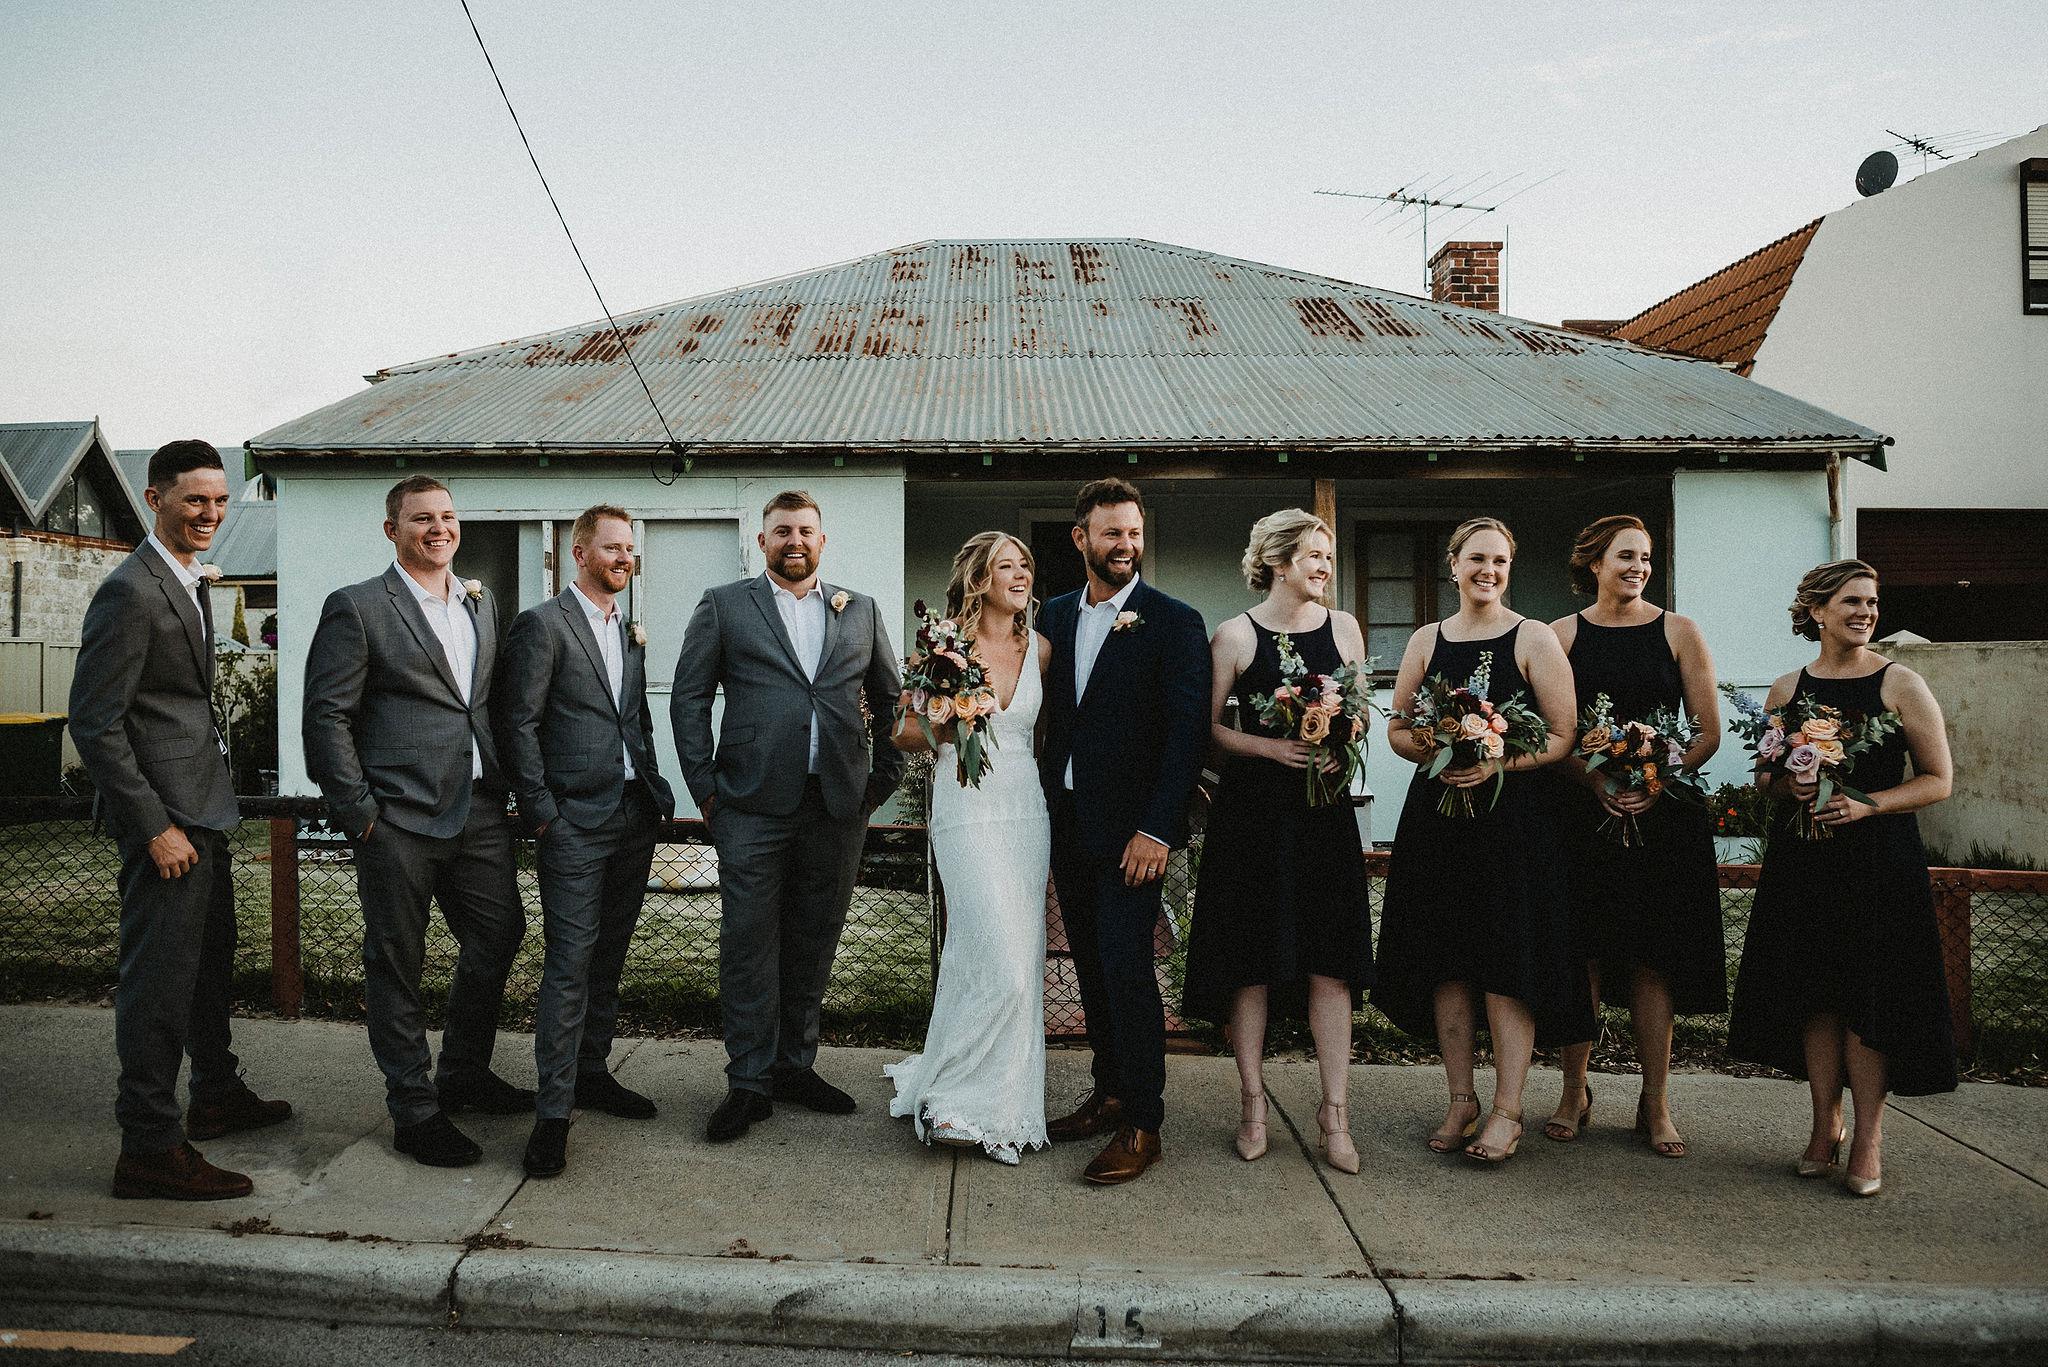 Perth Wedding Bridal Party